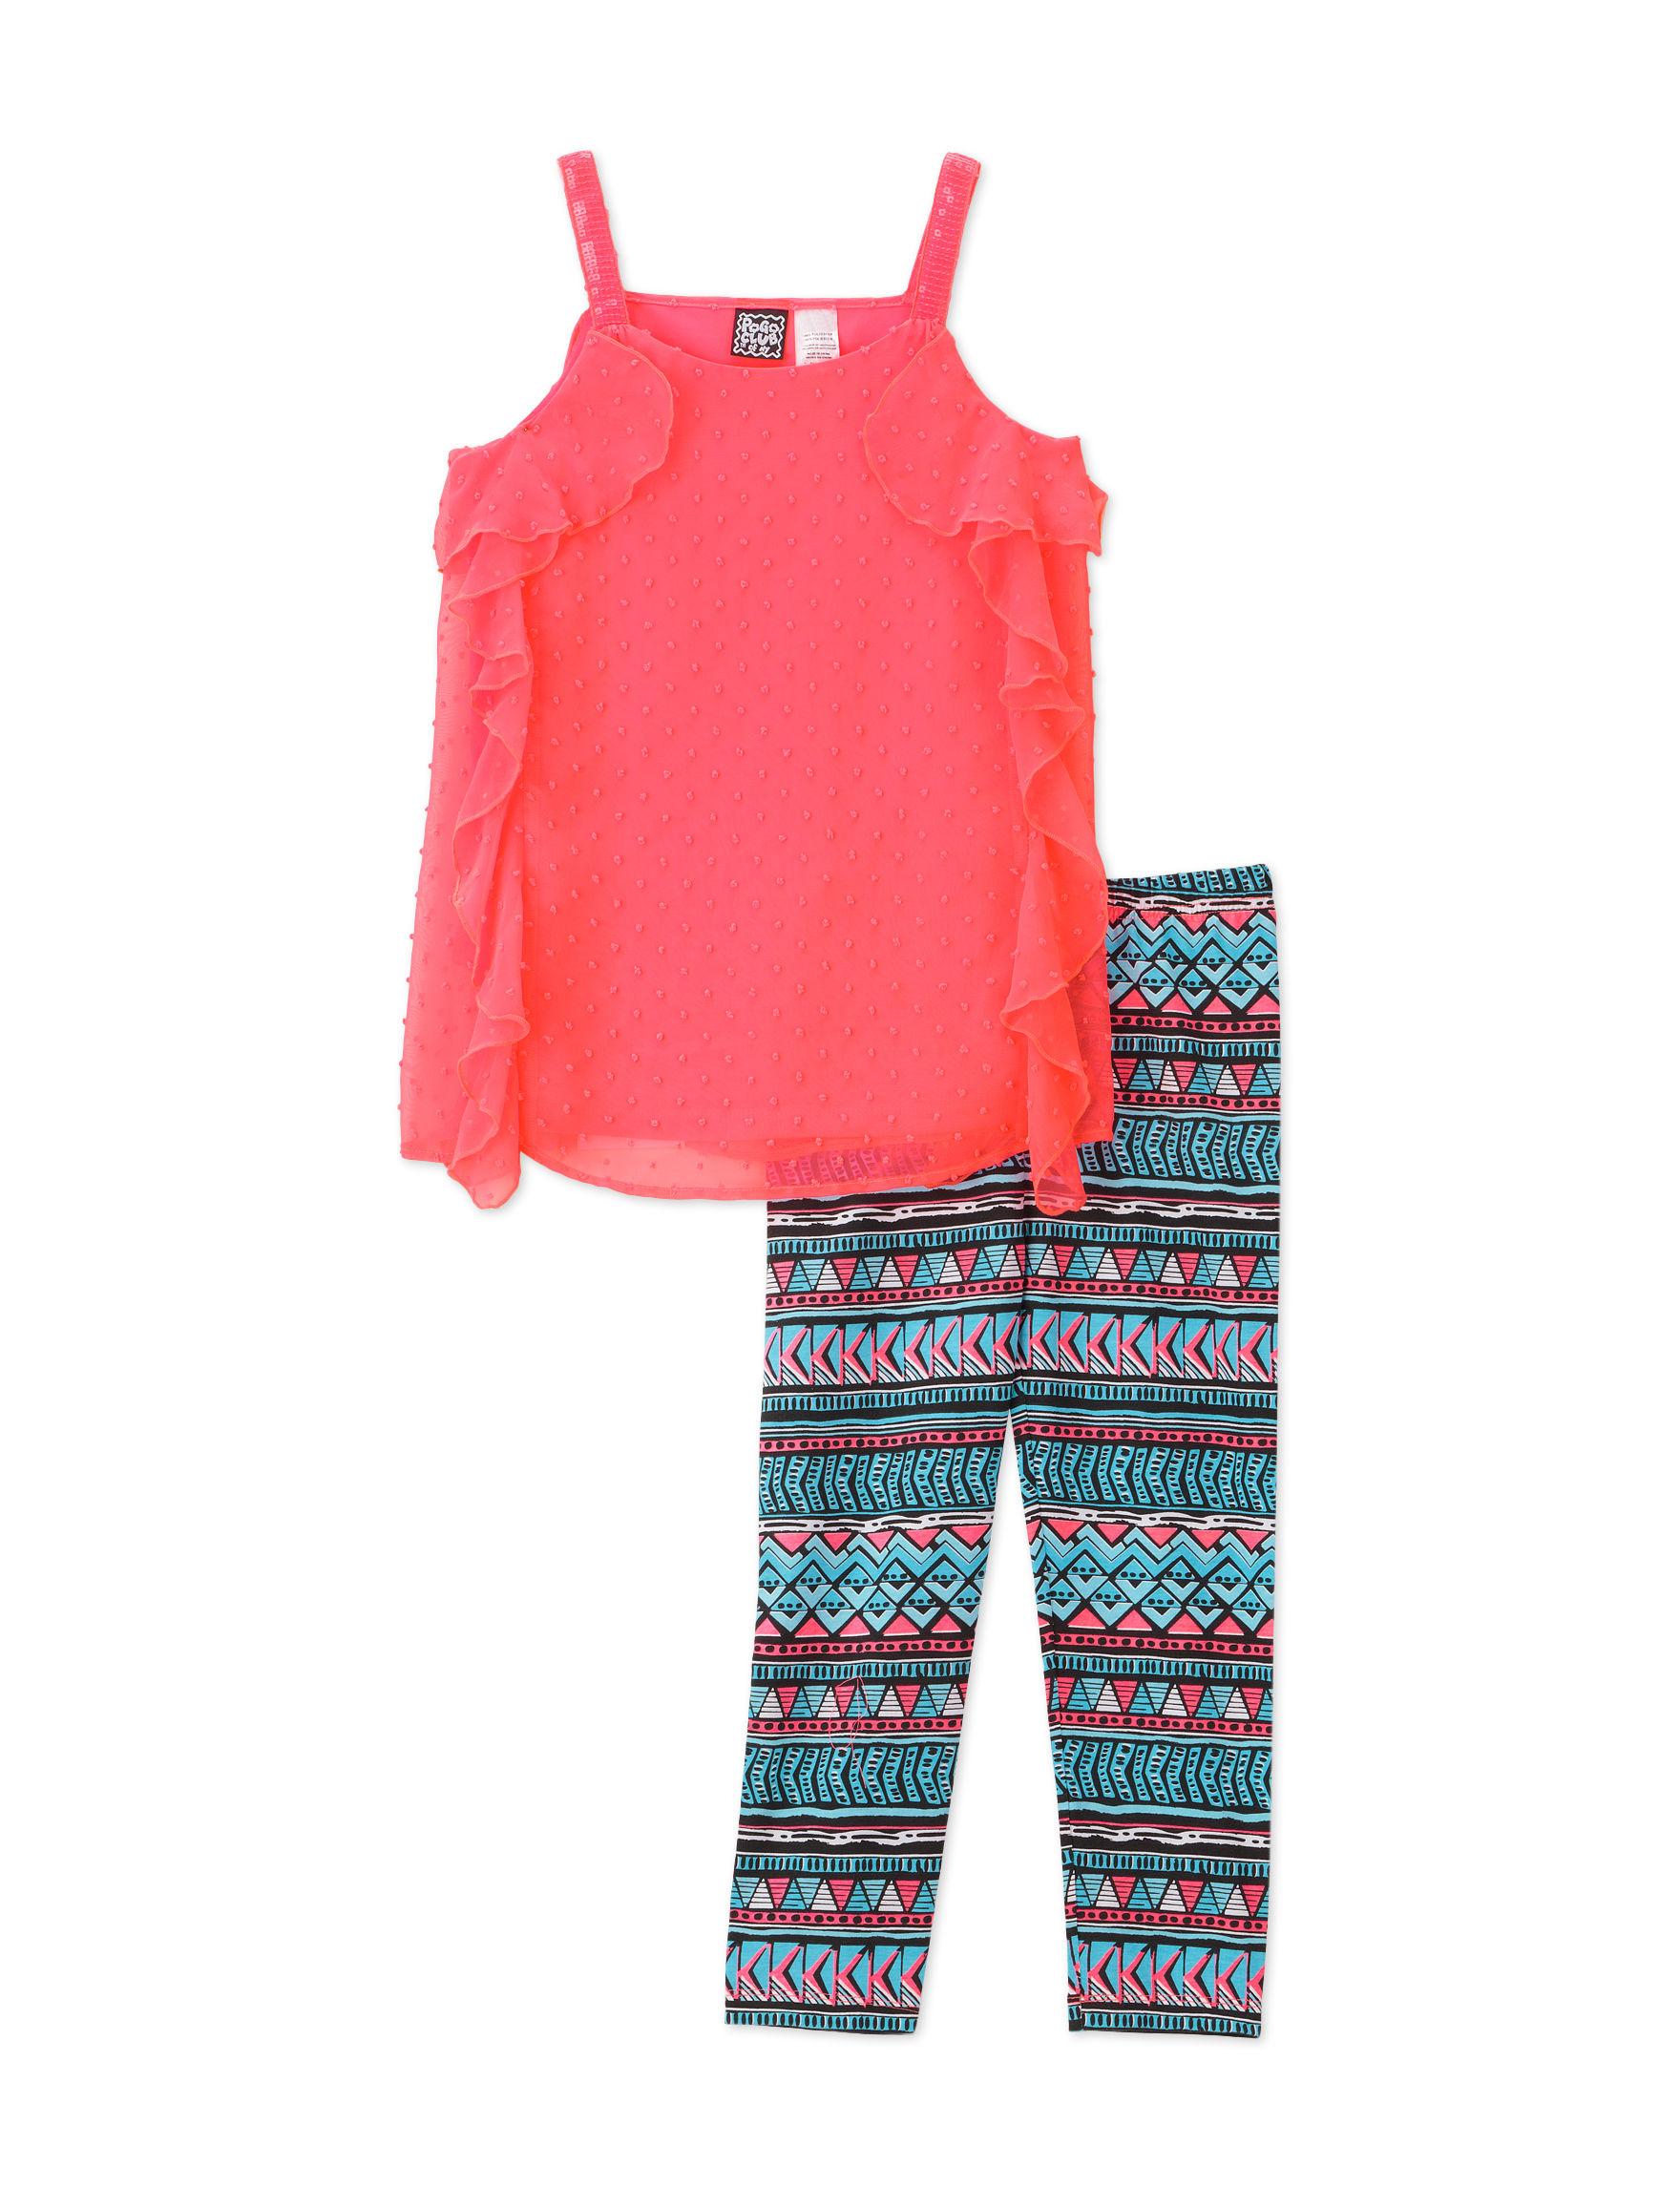 Pogo Club 2-pc. Brianna Swiss Dot Chiffon Top & Aztec Print Leggings - Girls 7-16 - Coral - S - Pogo Club coupon codes 2016